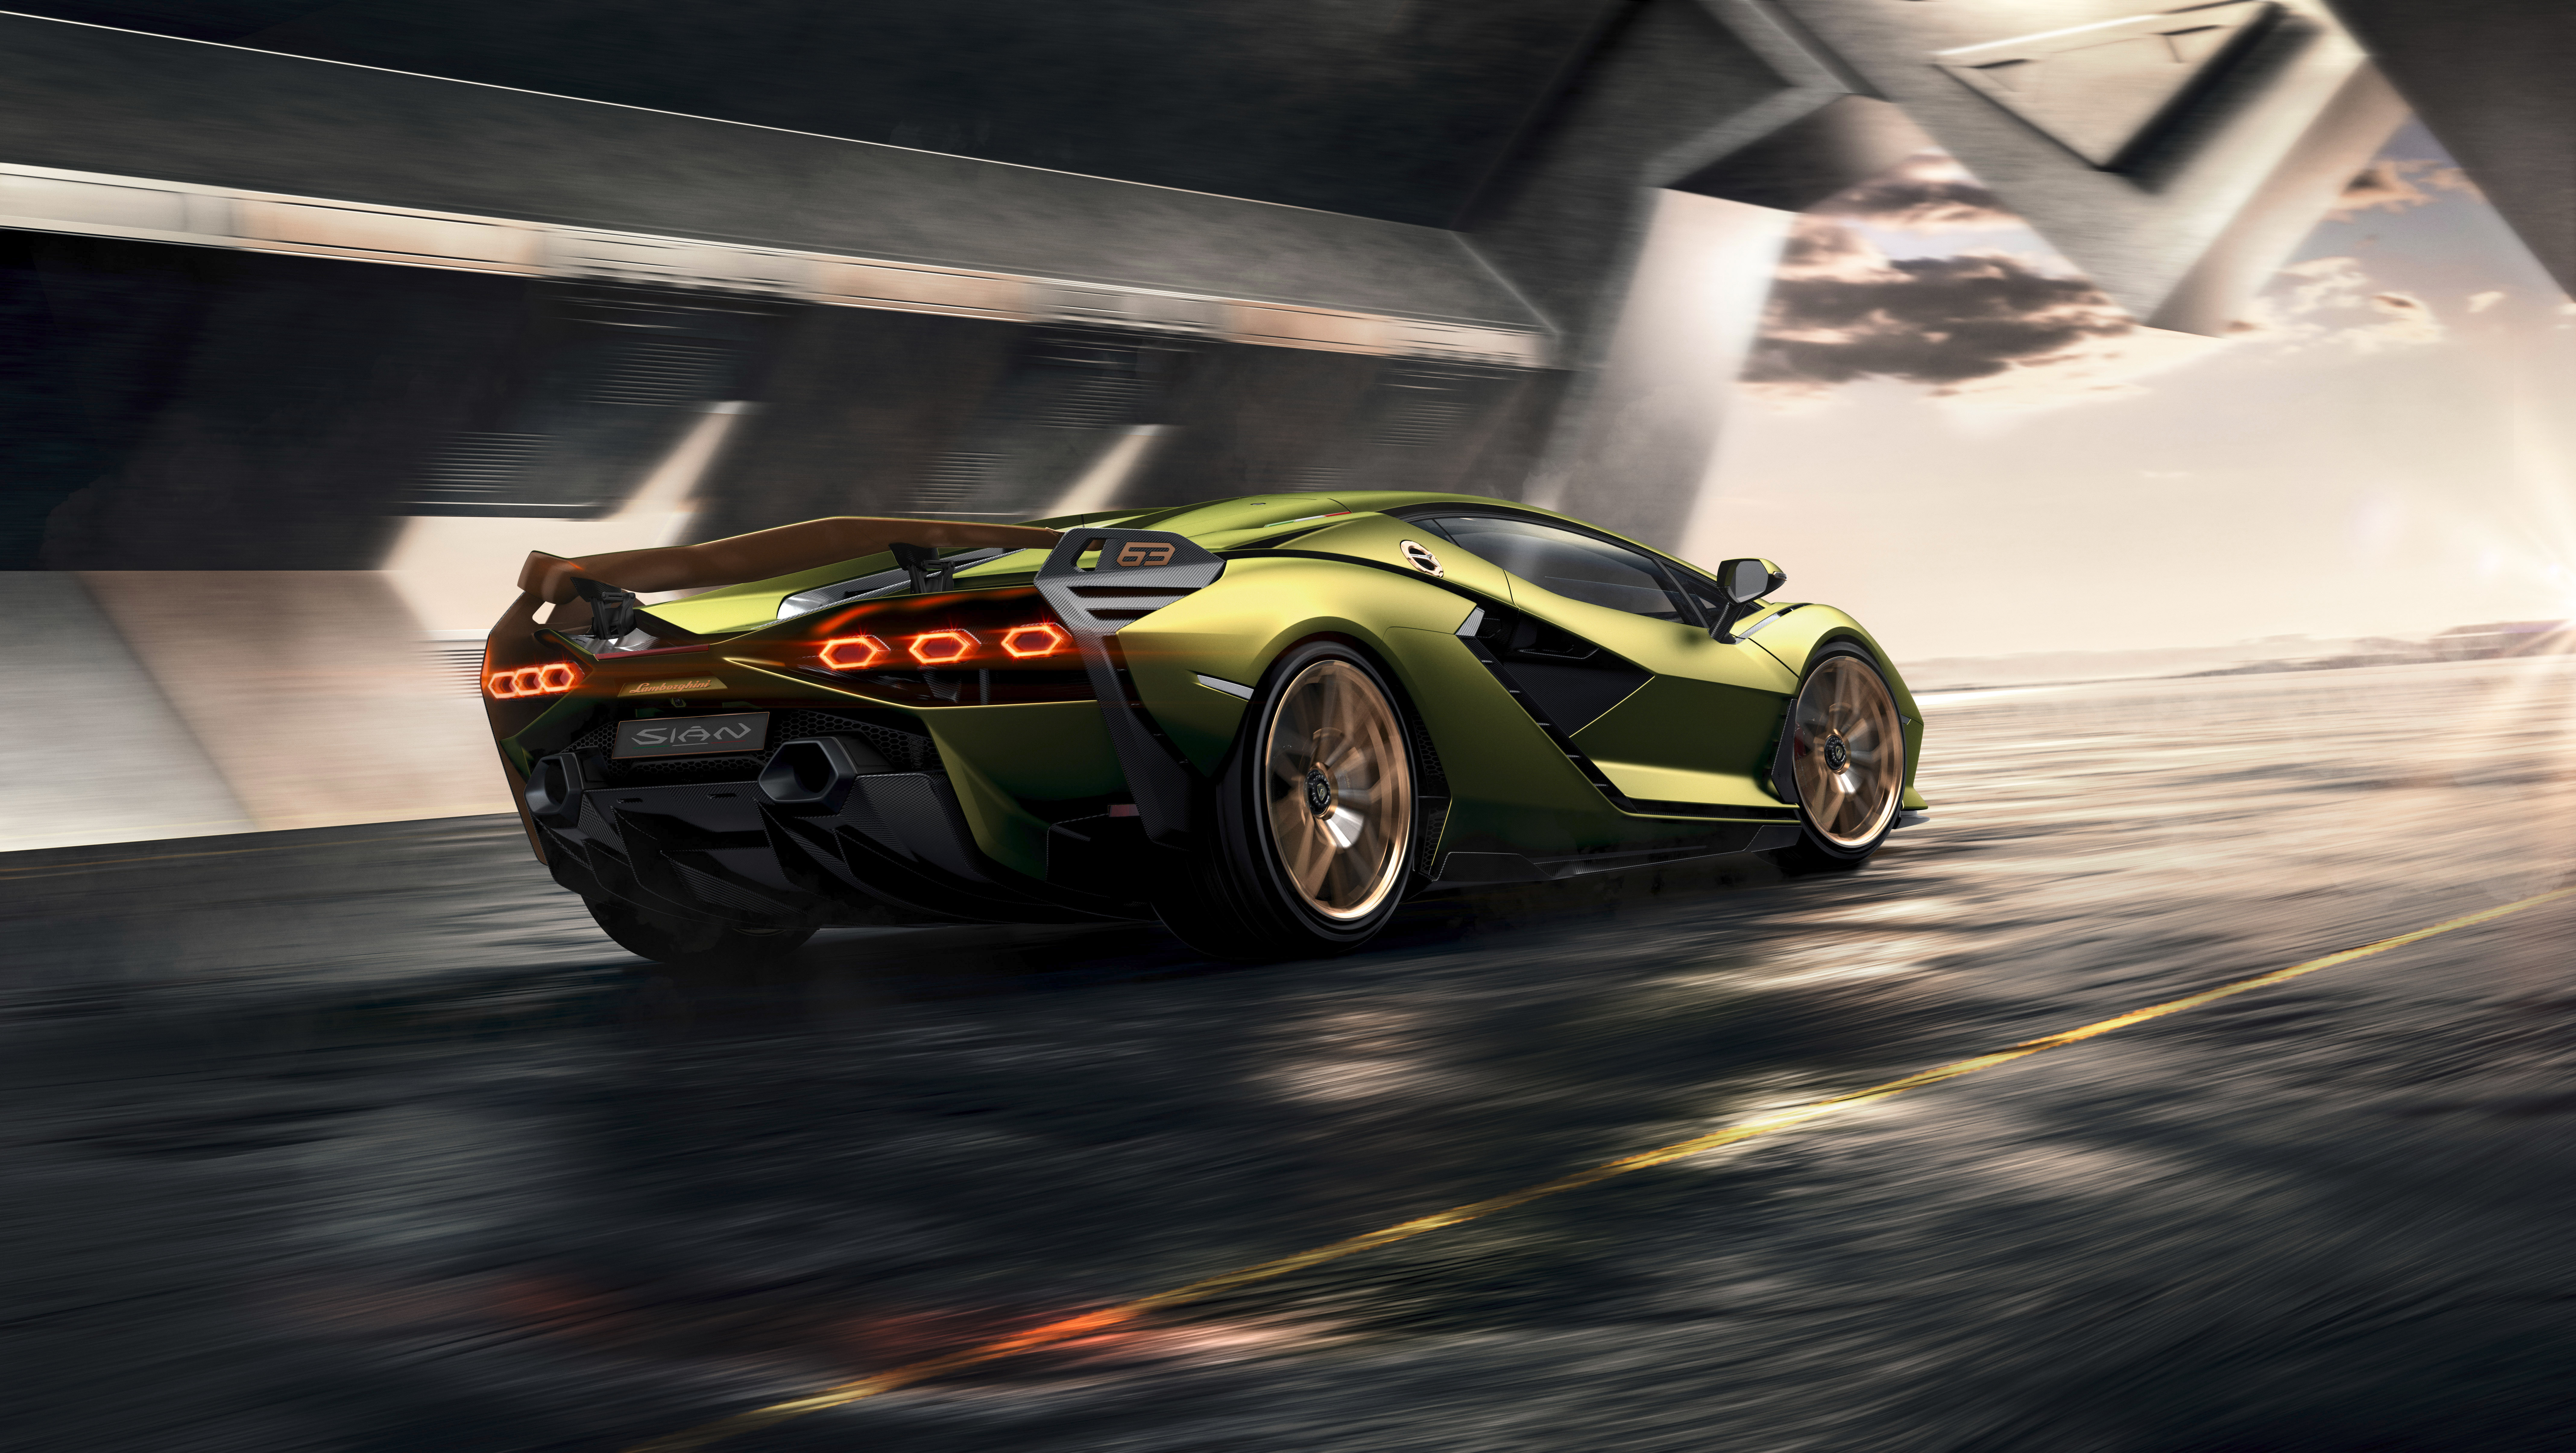 2019 8k Lamborghini Sian Hd Cars 4k Wallpapers Images